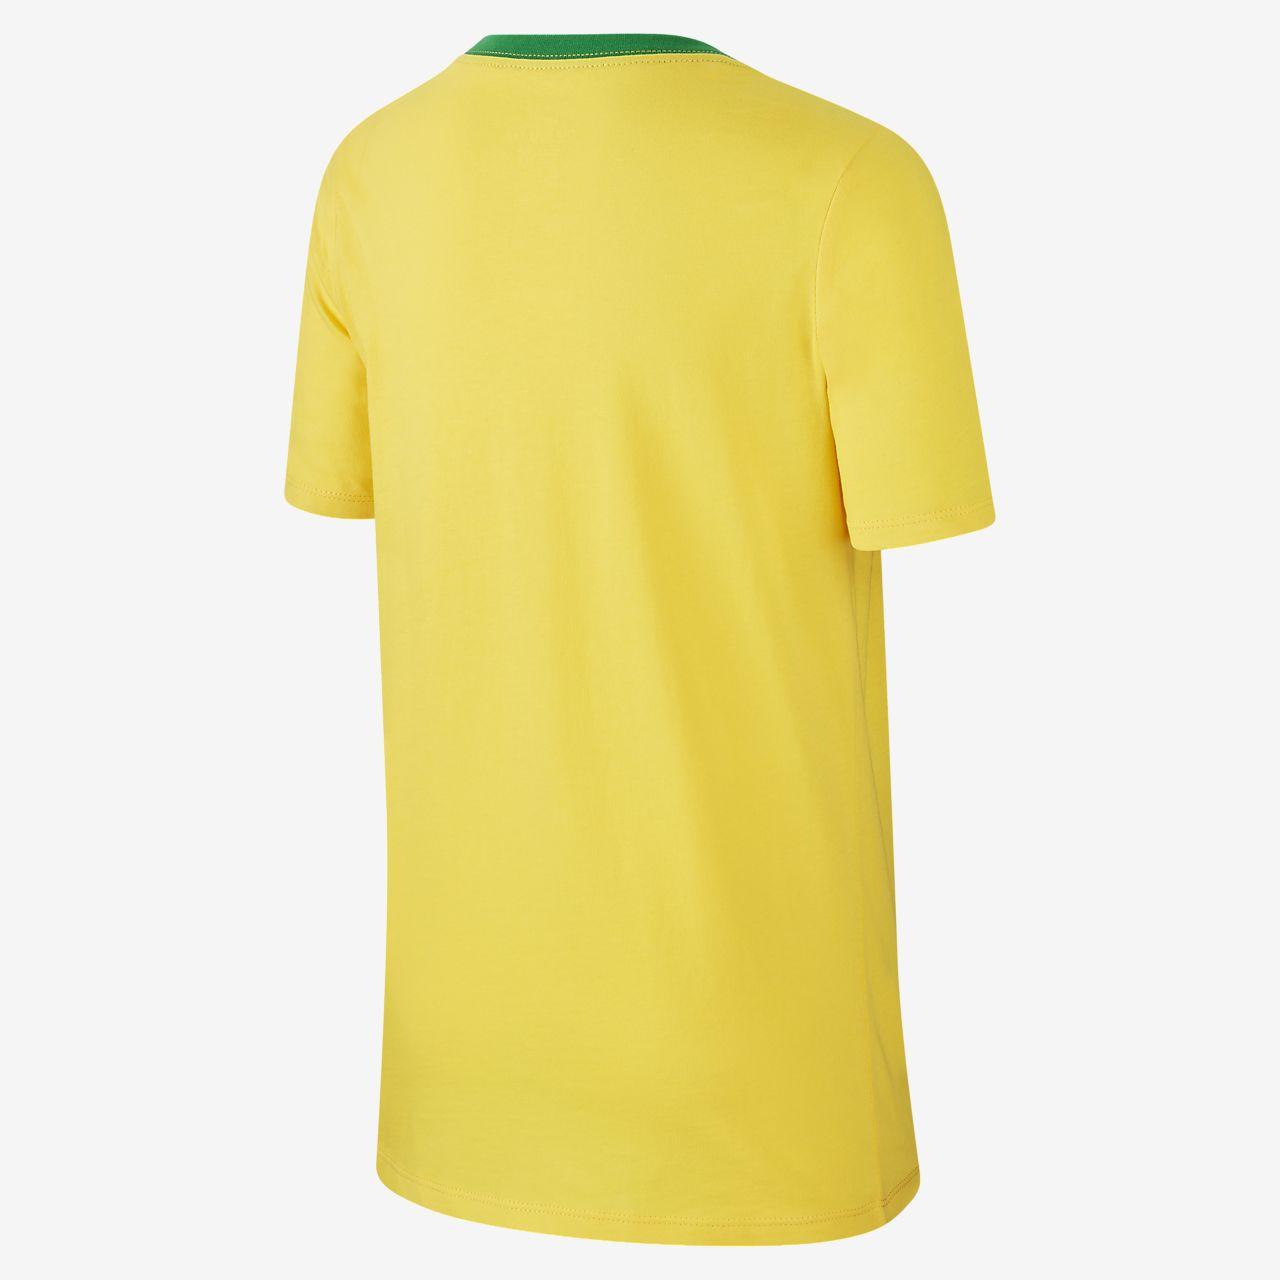 0a0dd911e Brazil CBF Crest Older Kids  (Boys ) T-Shirt. Nike.com GB